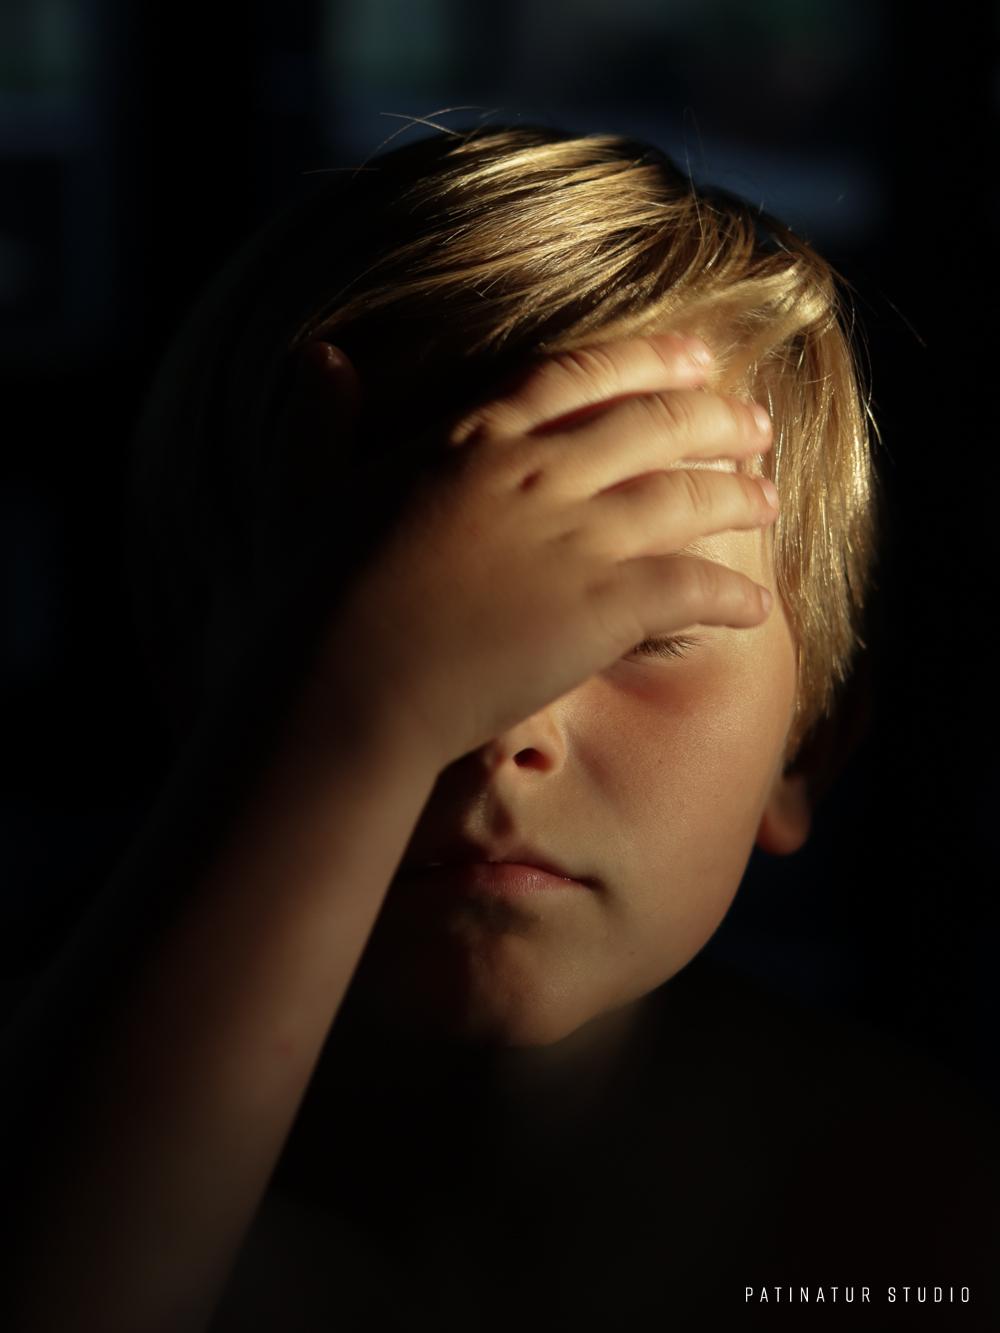 Chiaroscuro portrait of boy